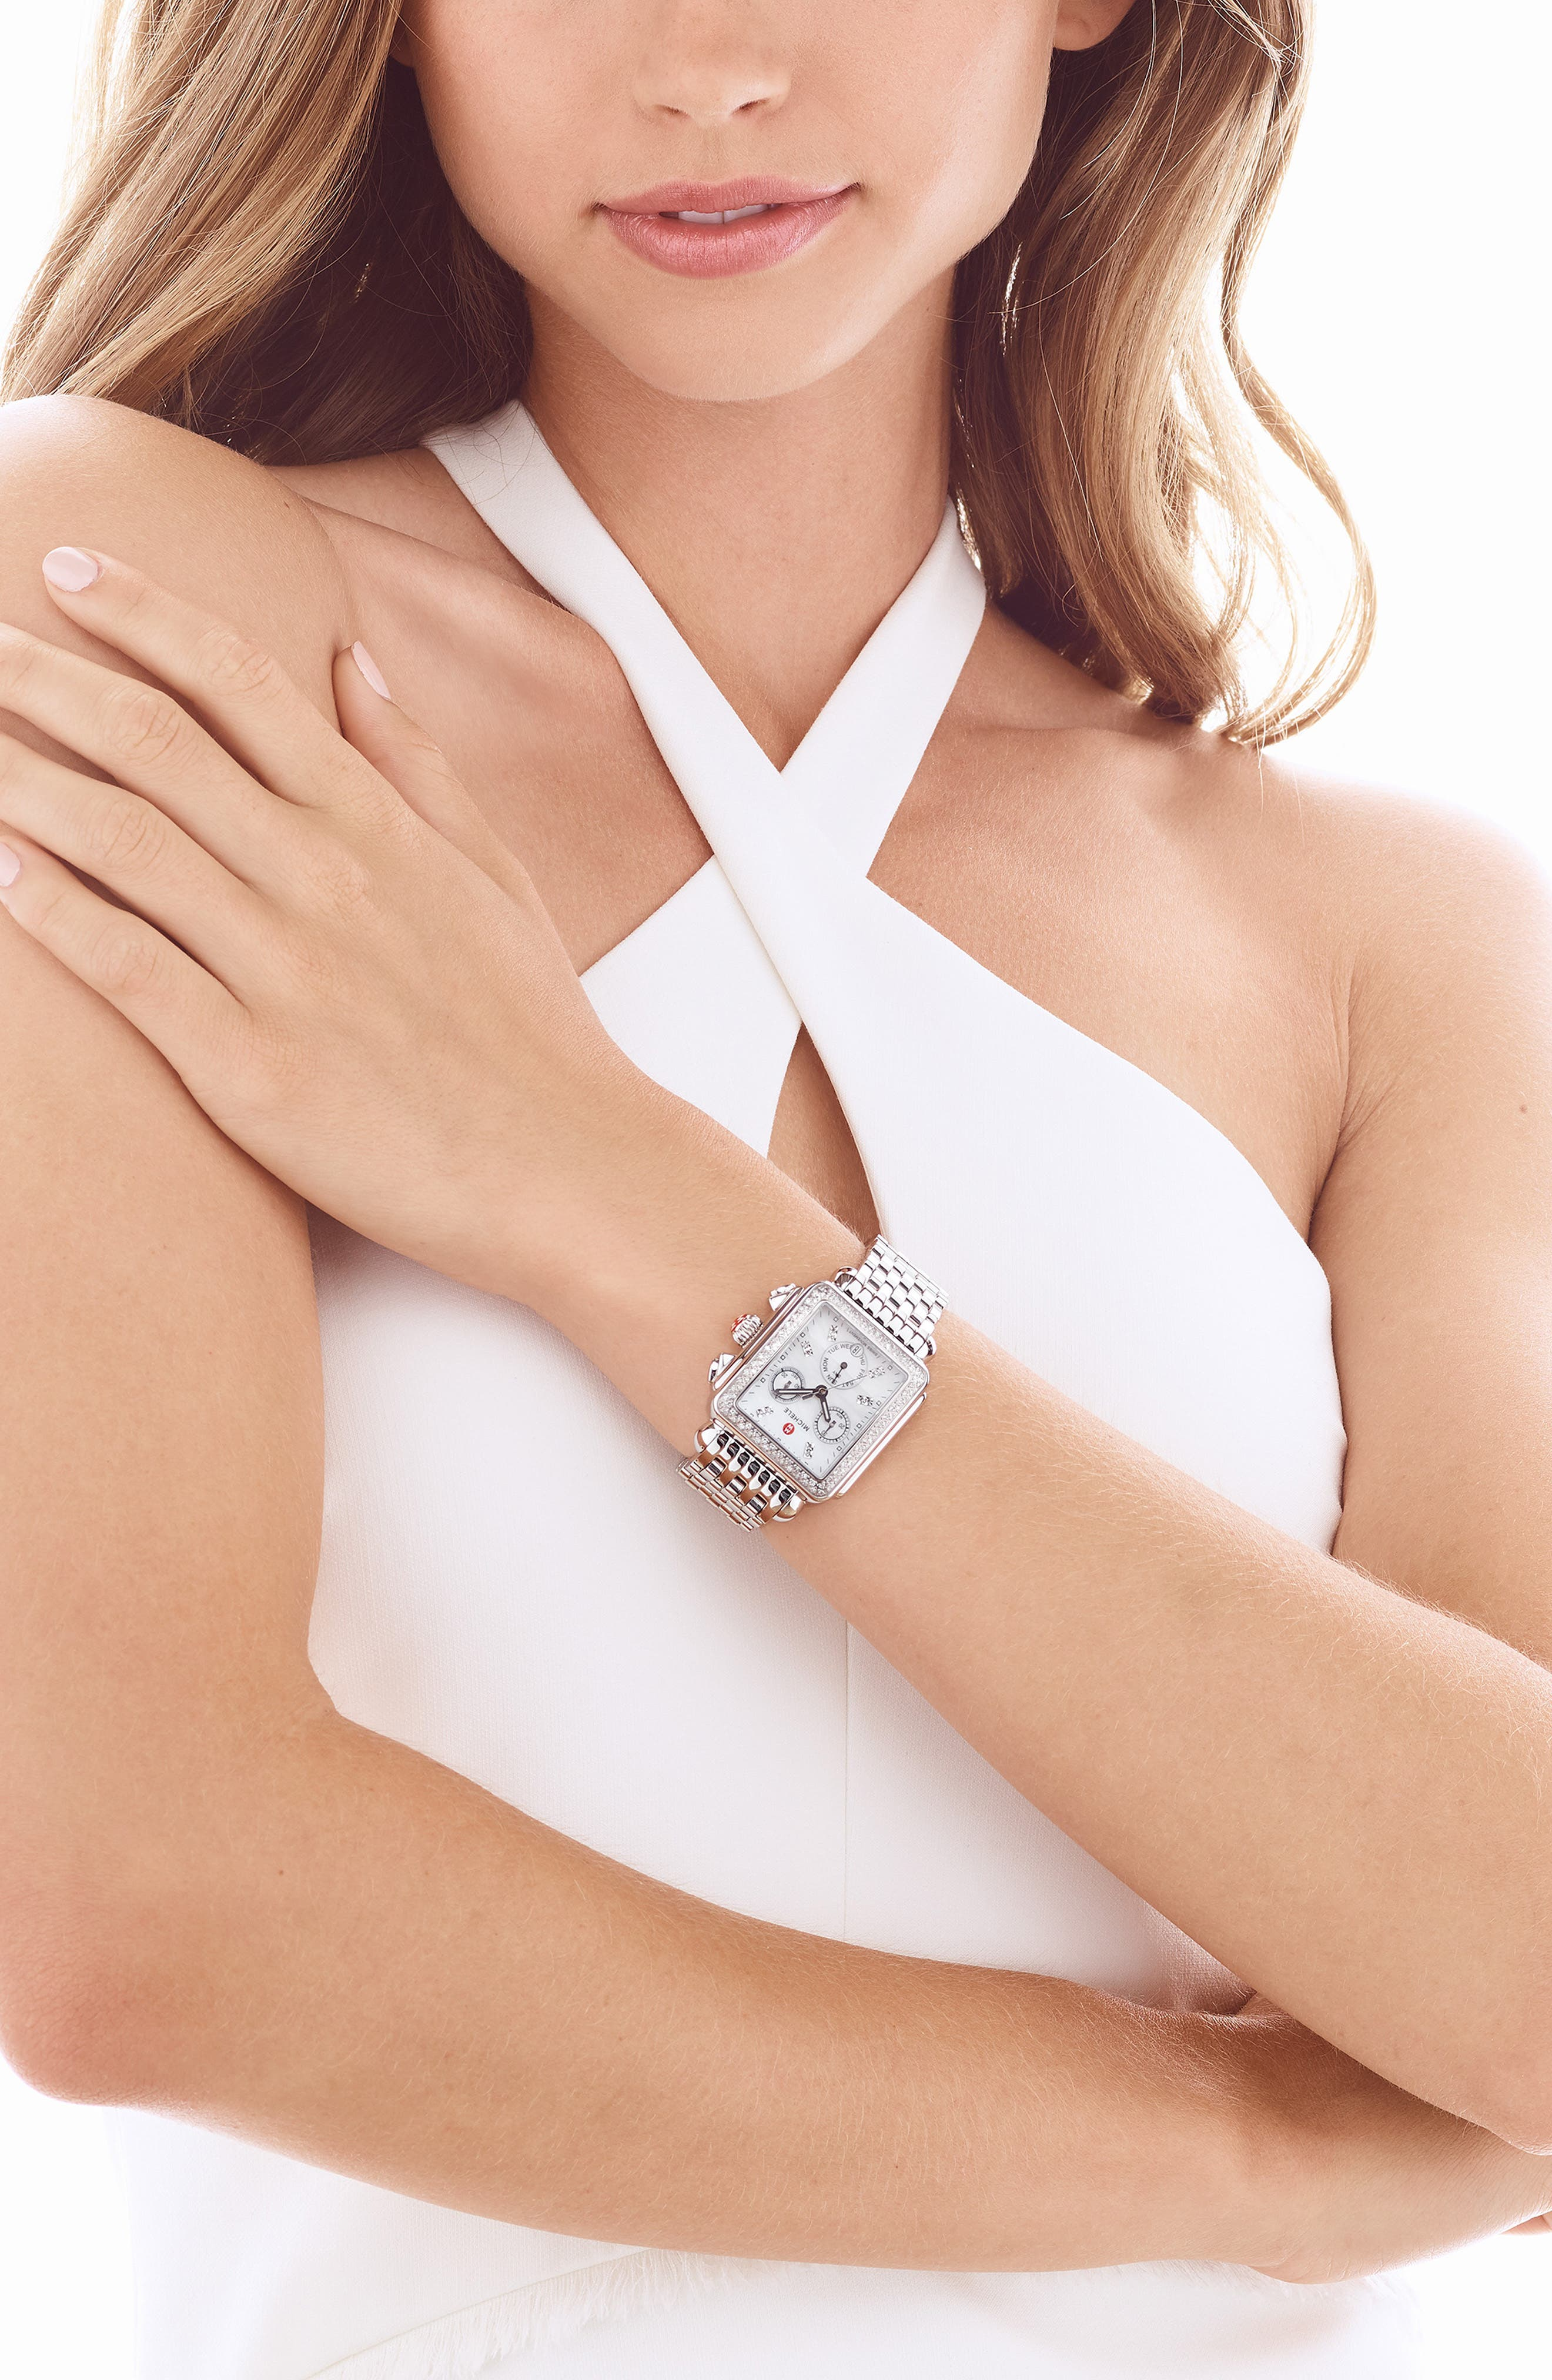 Deco 18mm Bracelet Watchband,                             Alternate thumbnail 2, color,                             SILVER